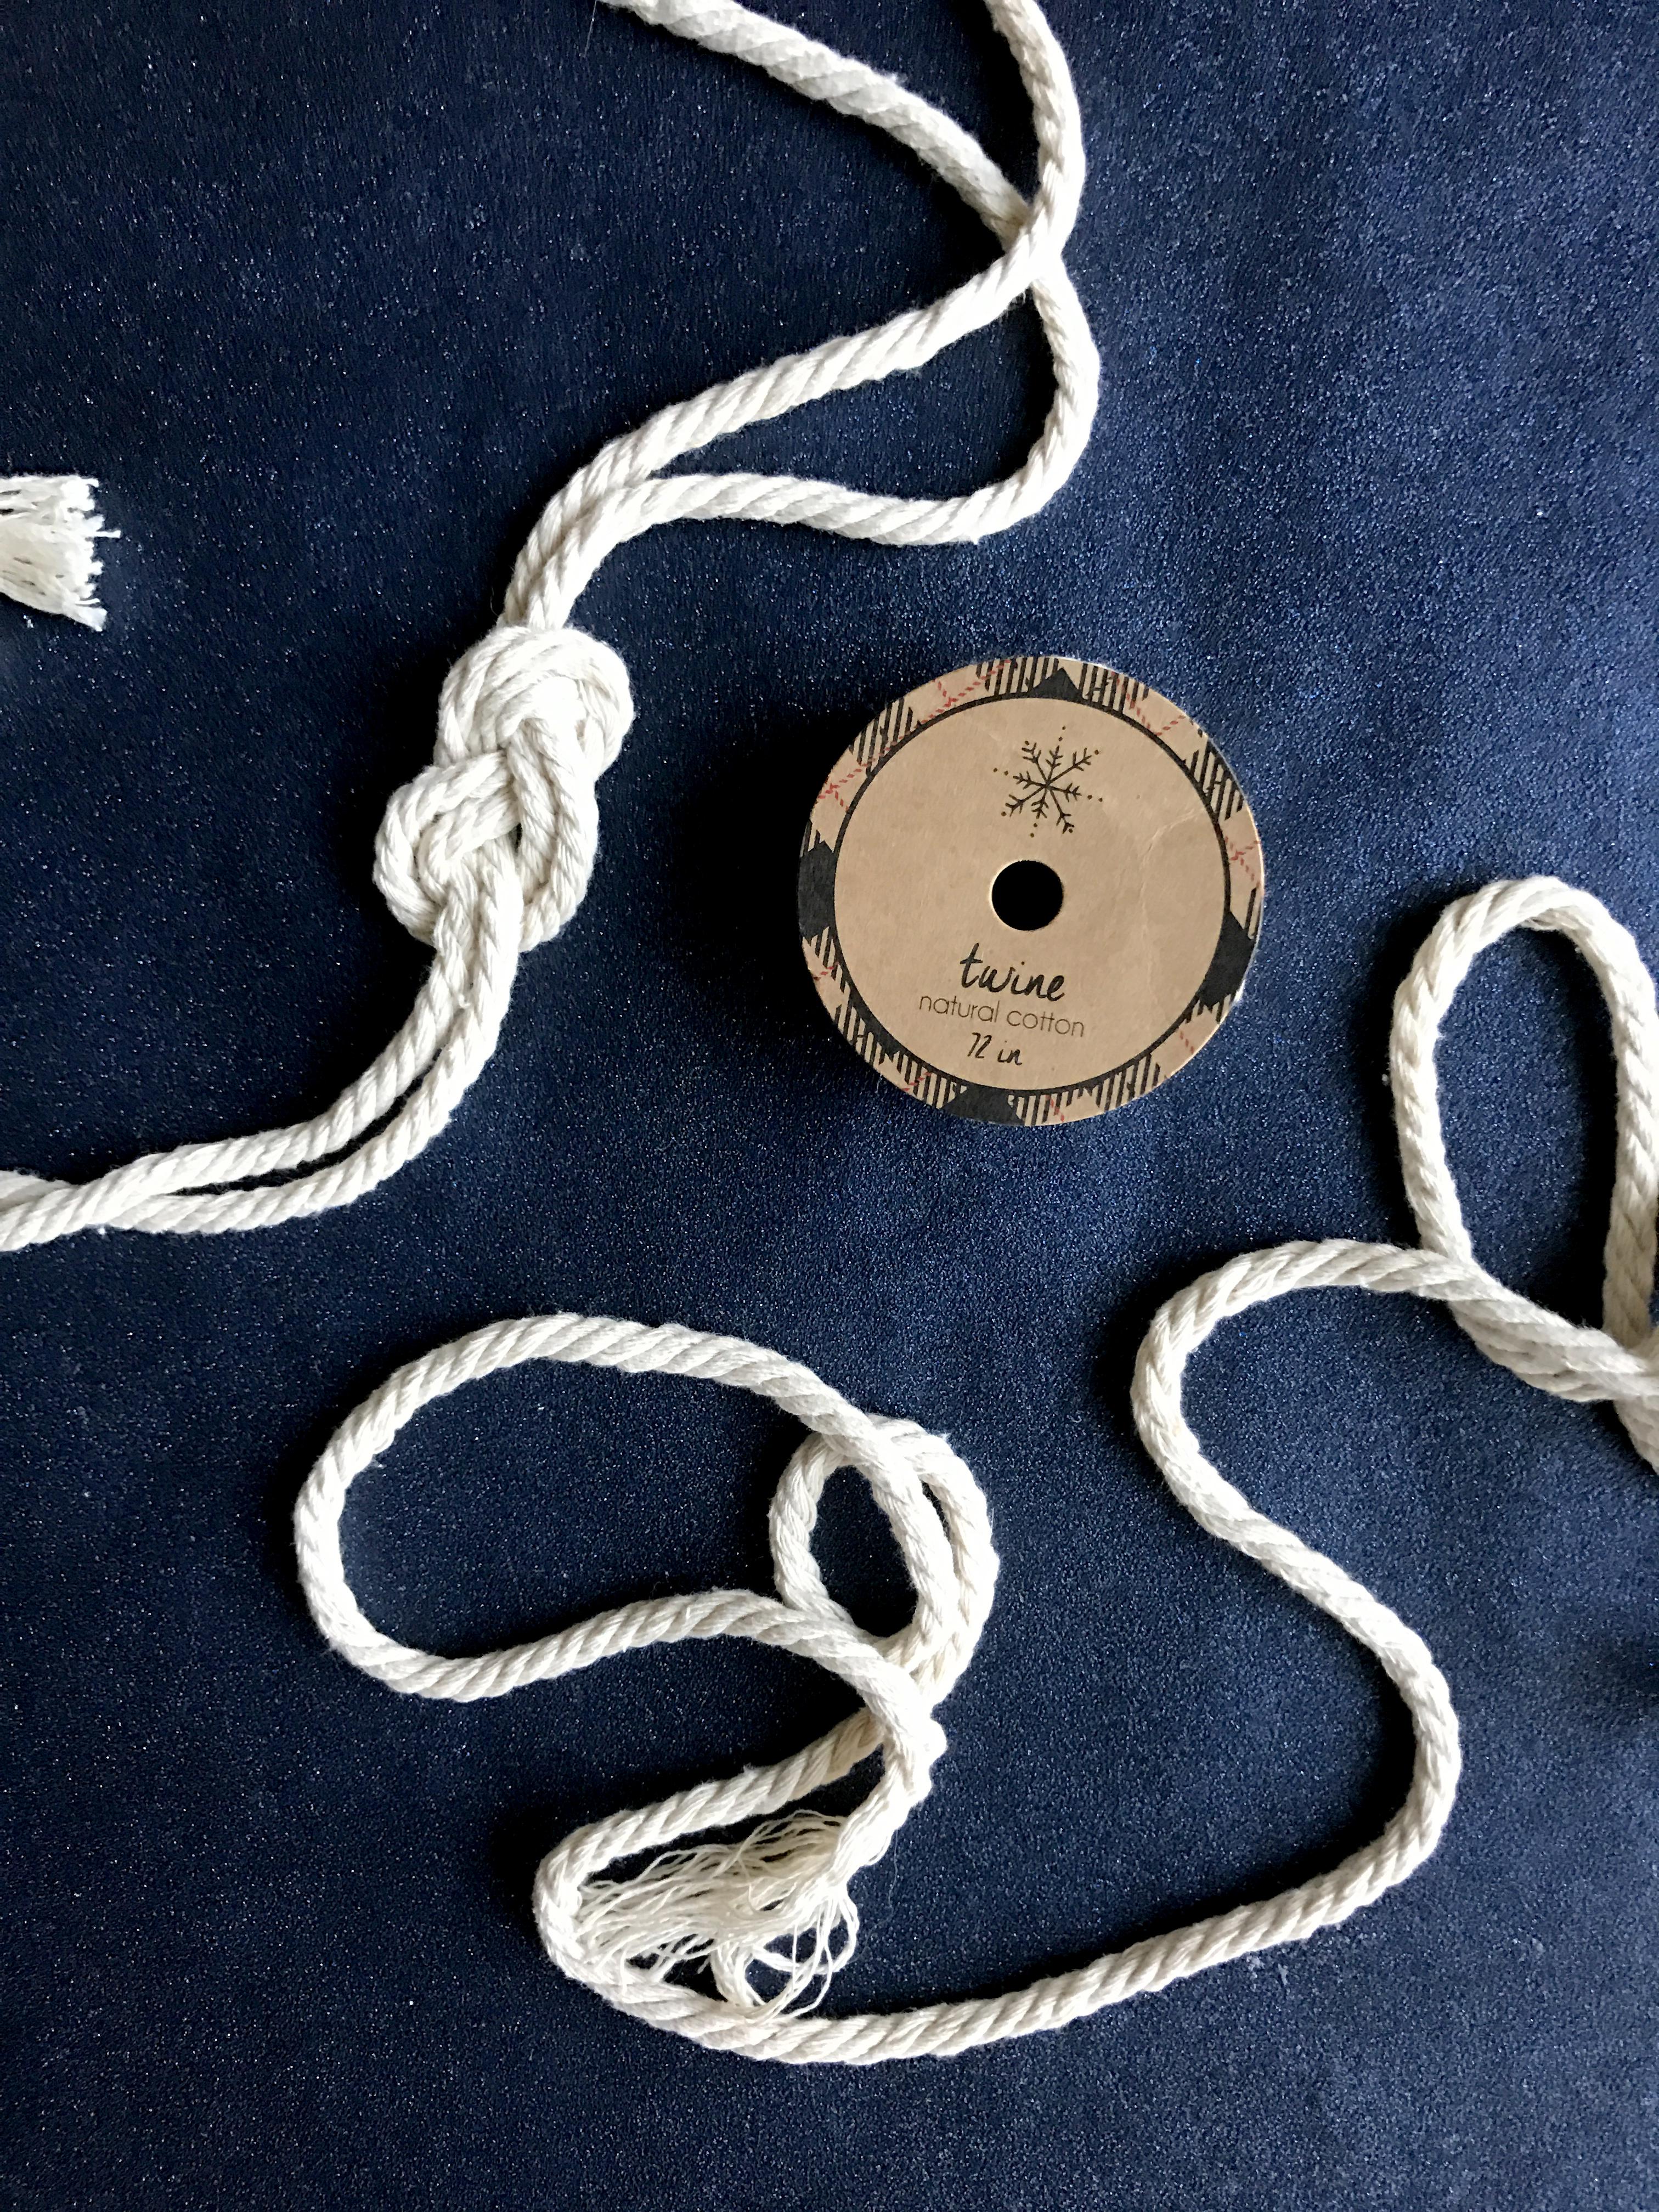 How To Create Nautical Knot Rope Garland Coastal Christmas Tree